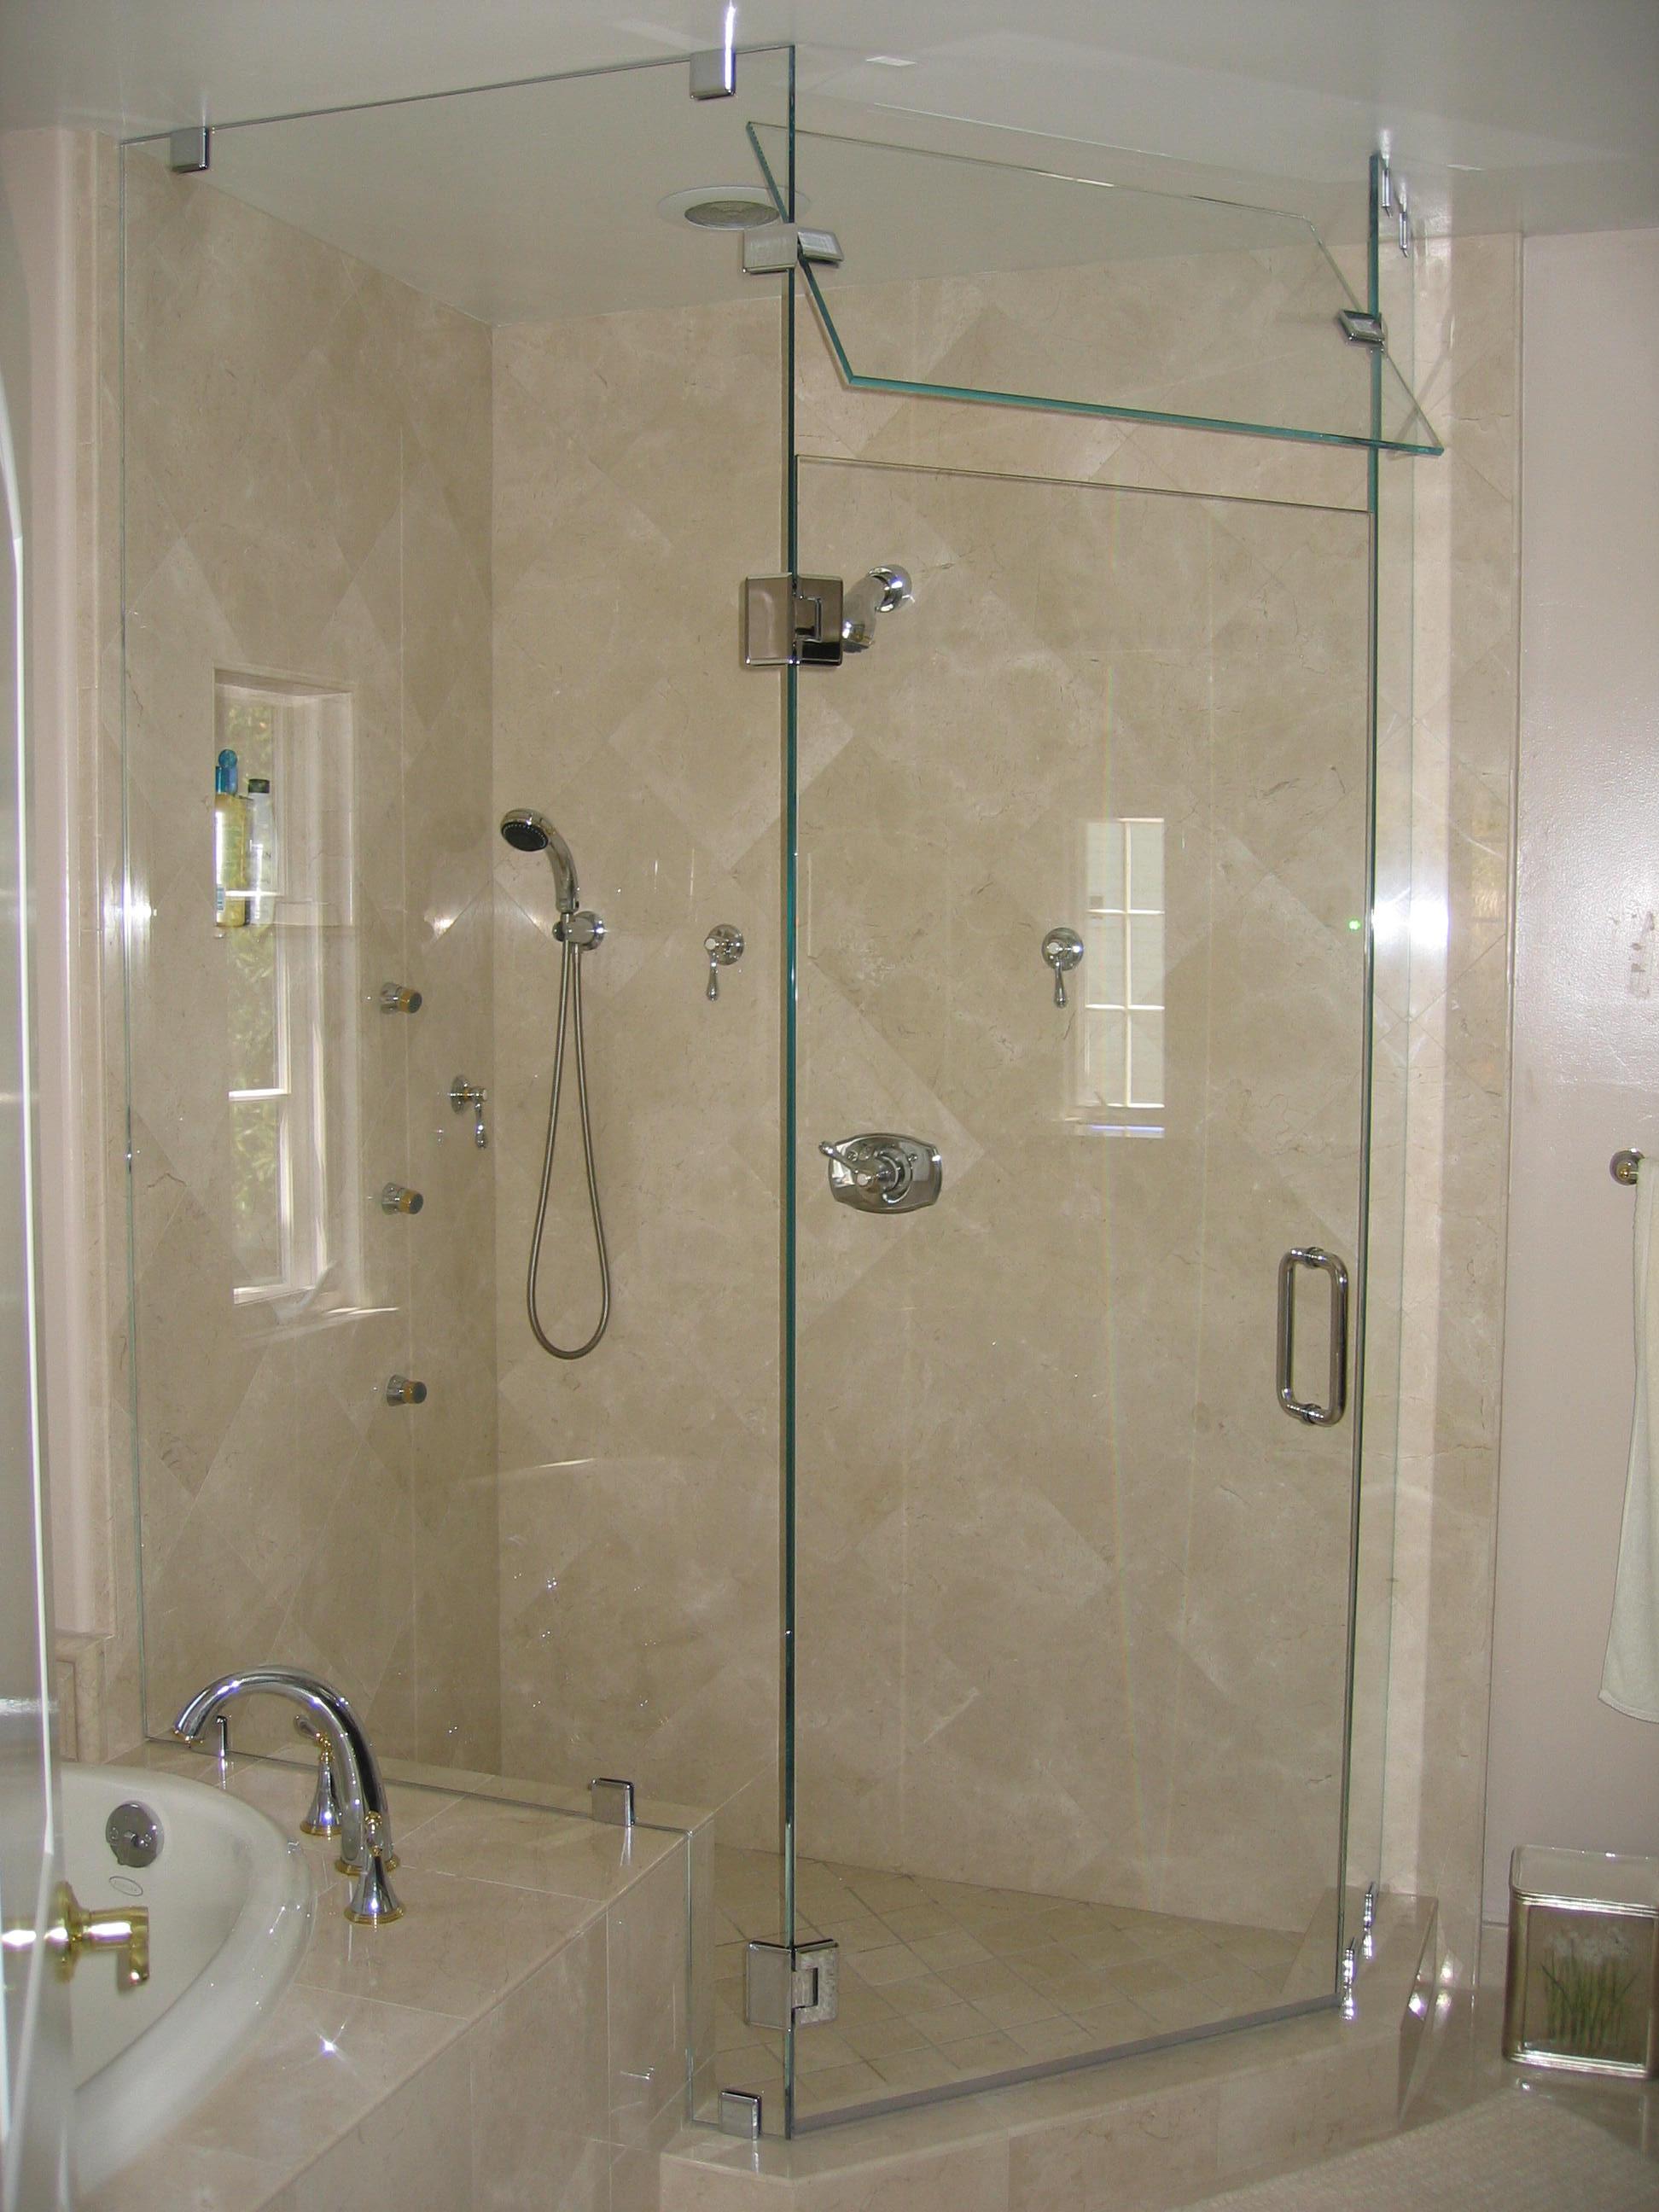 Austin tx bathroom remodeling - Austin Tx Bathroom Remodeling